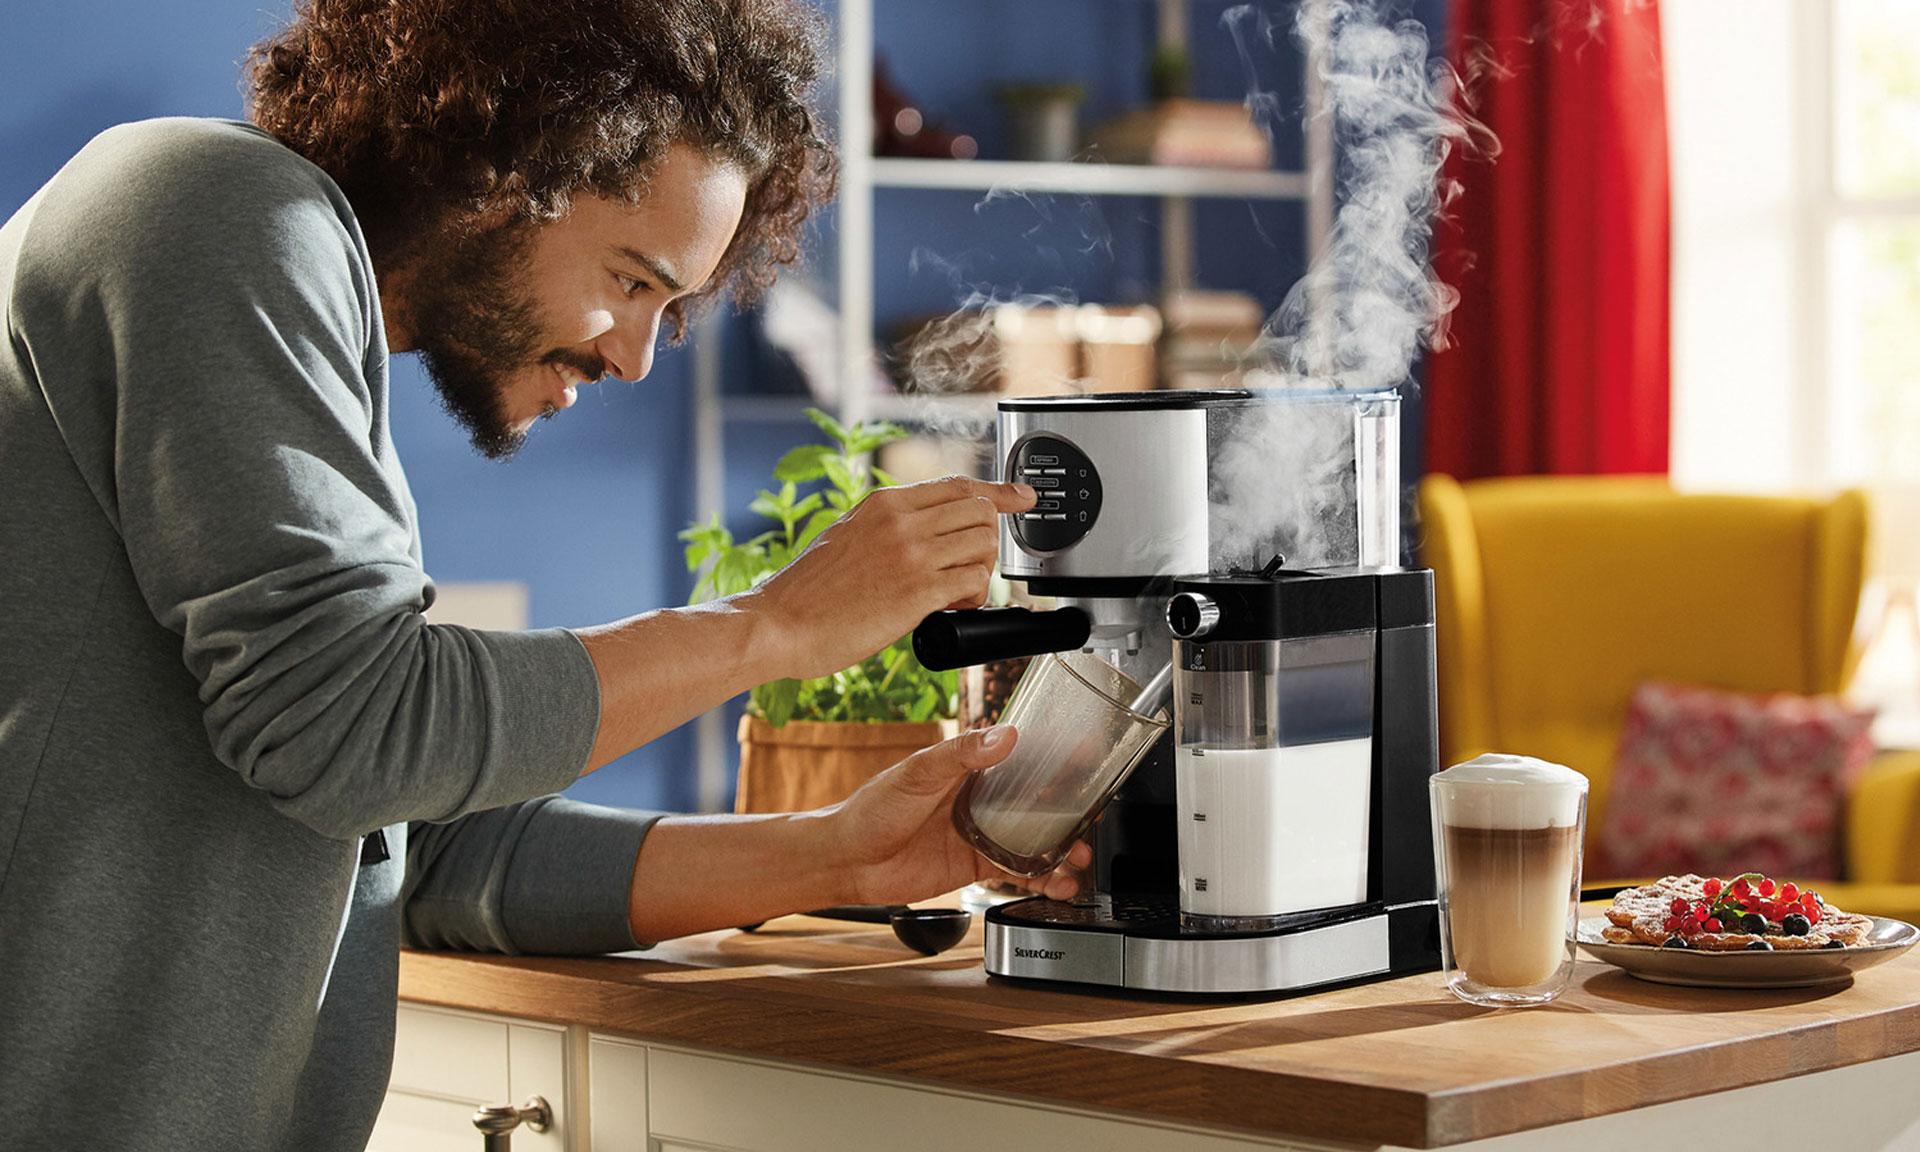 Should You Buy Lidls Cheap 80 Coffee Machine This Christmas